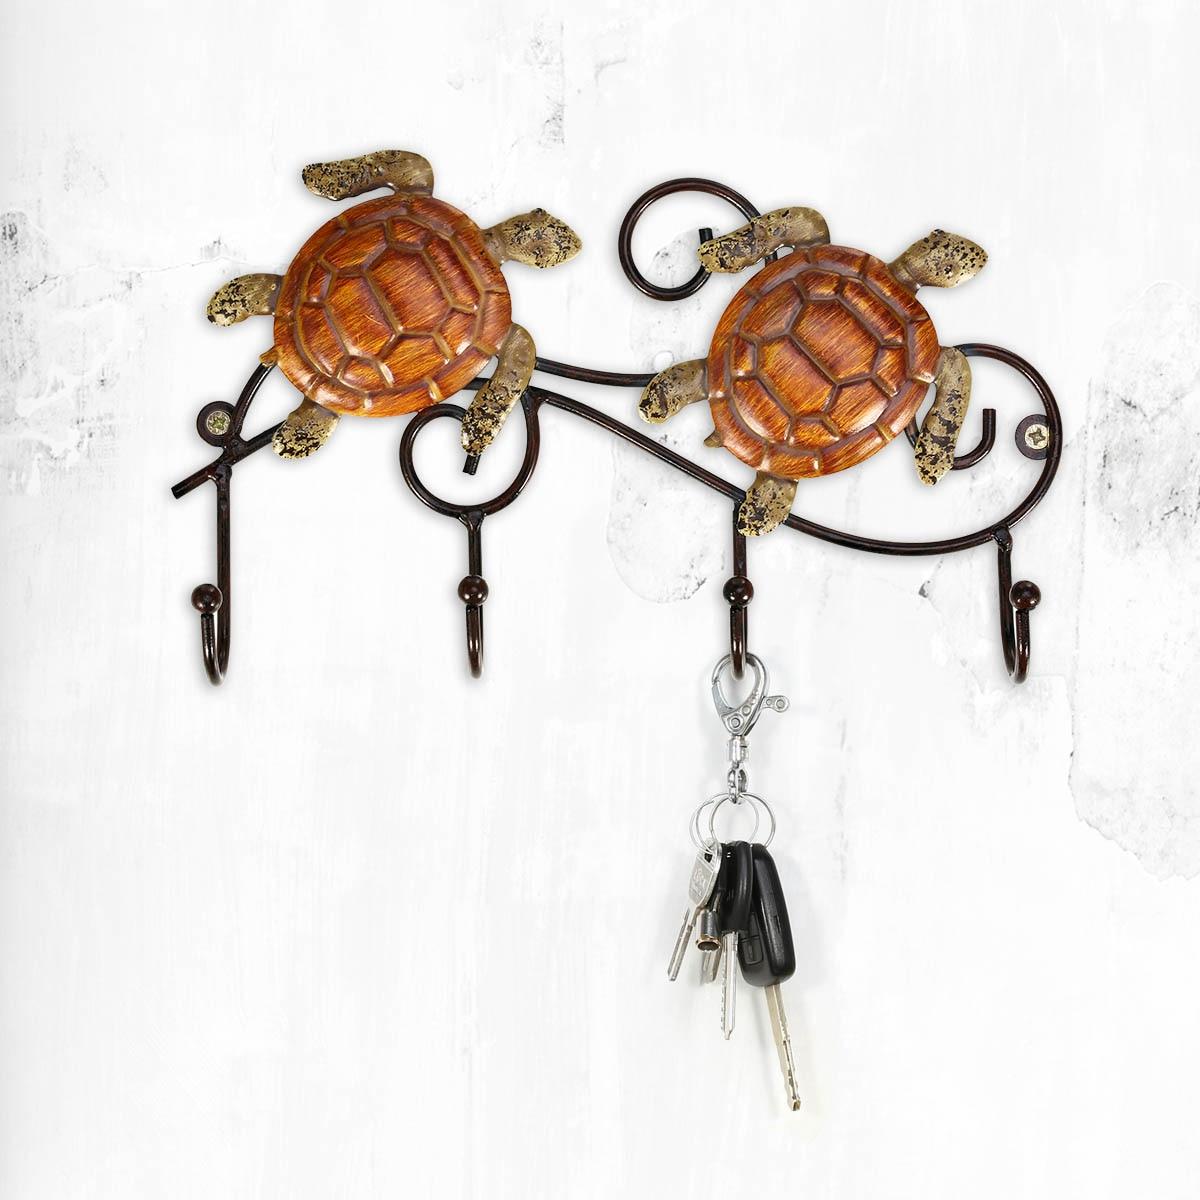 Tooarts Wall Mounted Iron Wall Hanger Vintage Design Turtle Shape Hooks with 4 Hooks Coats Keys